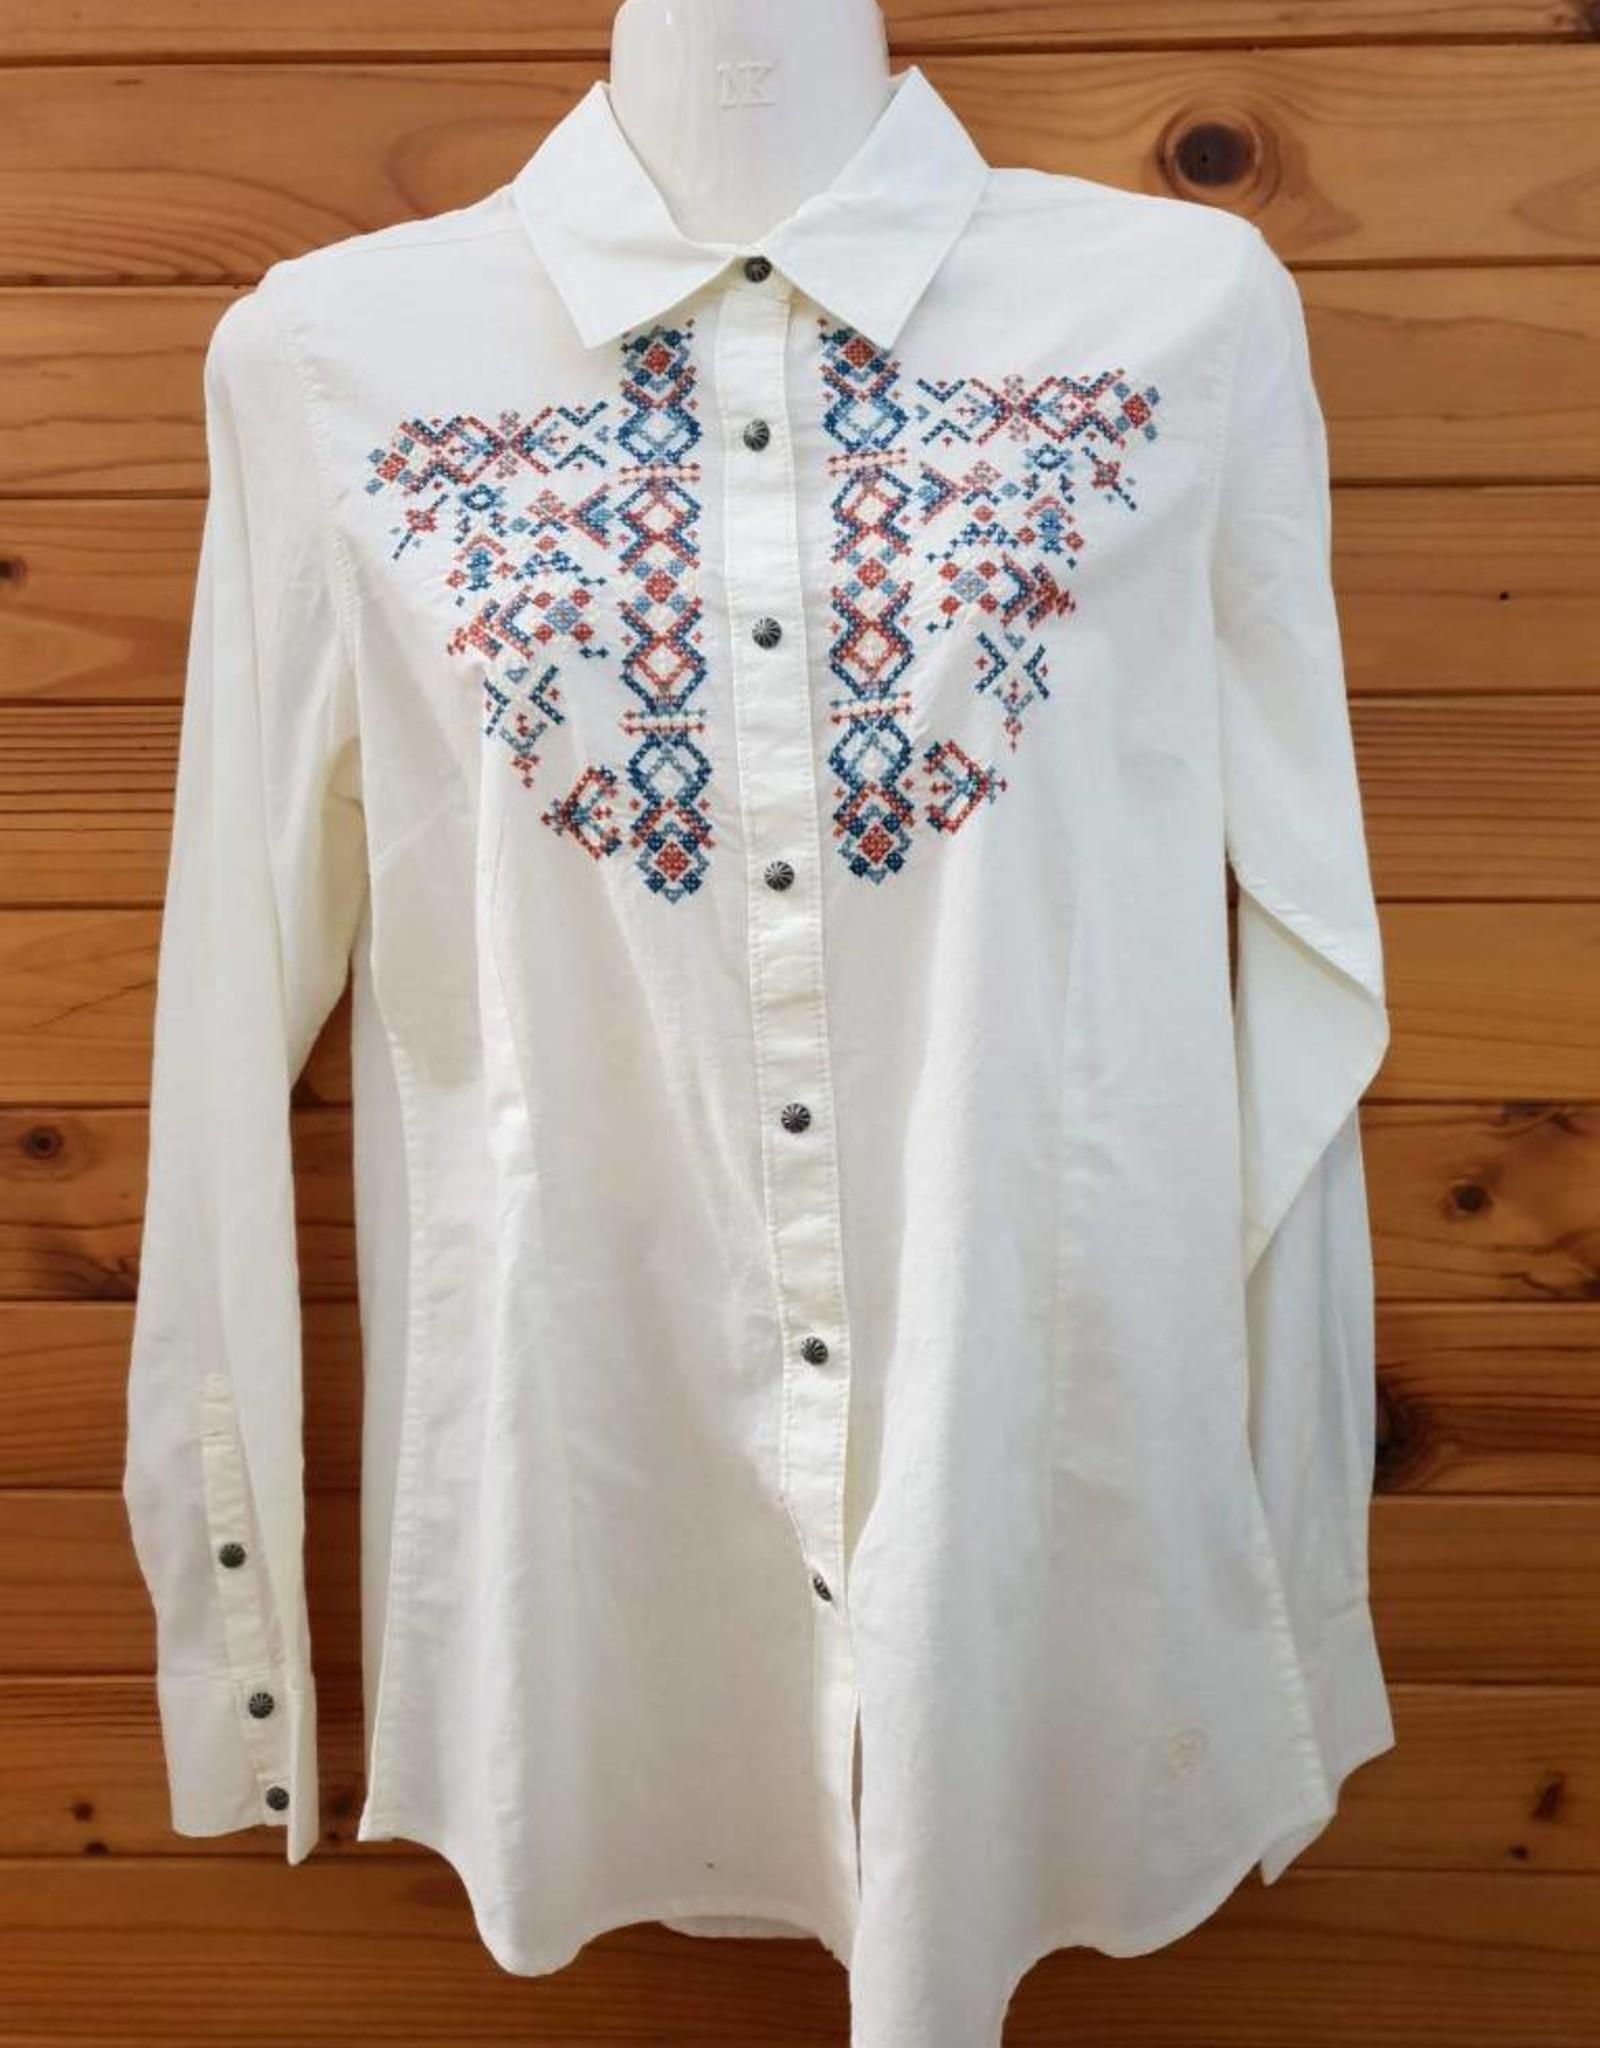 Ariat Ariat Hatch Snap Shirt - Ivory - Size L